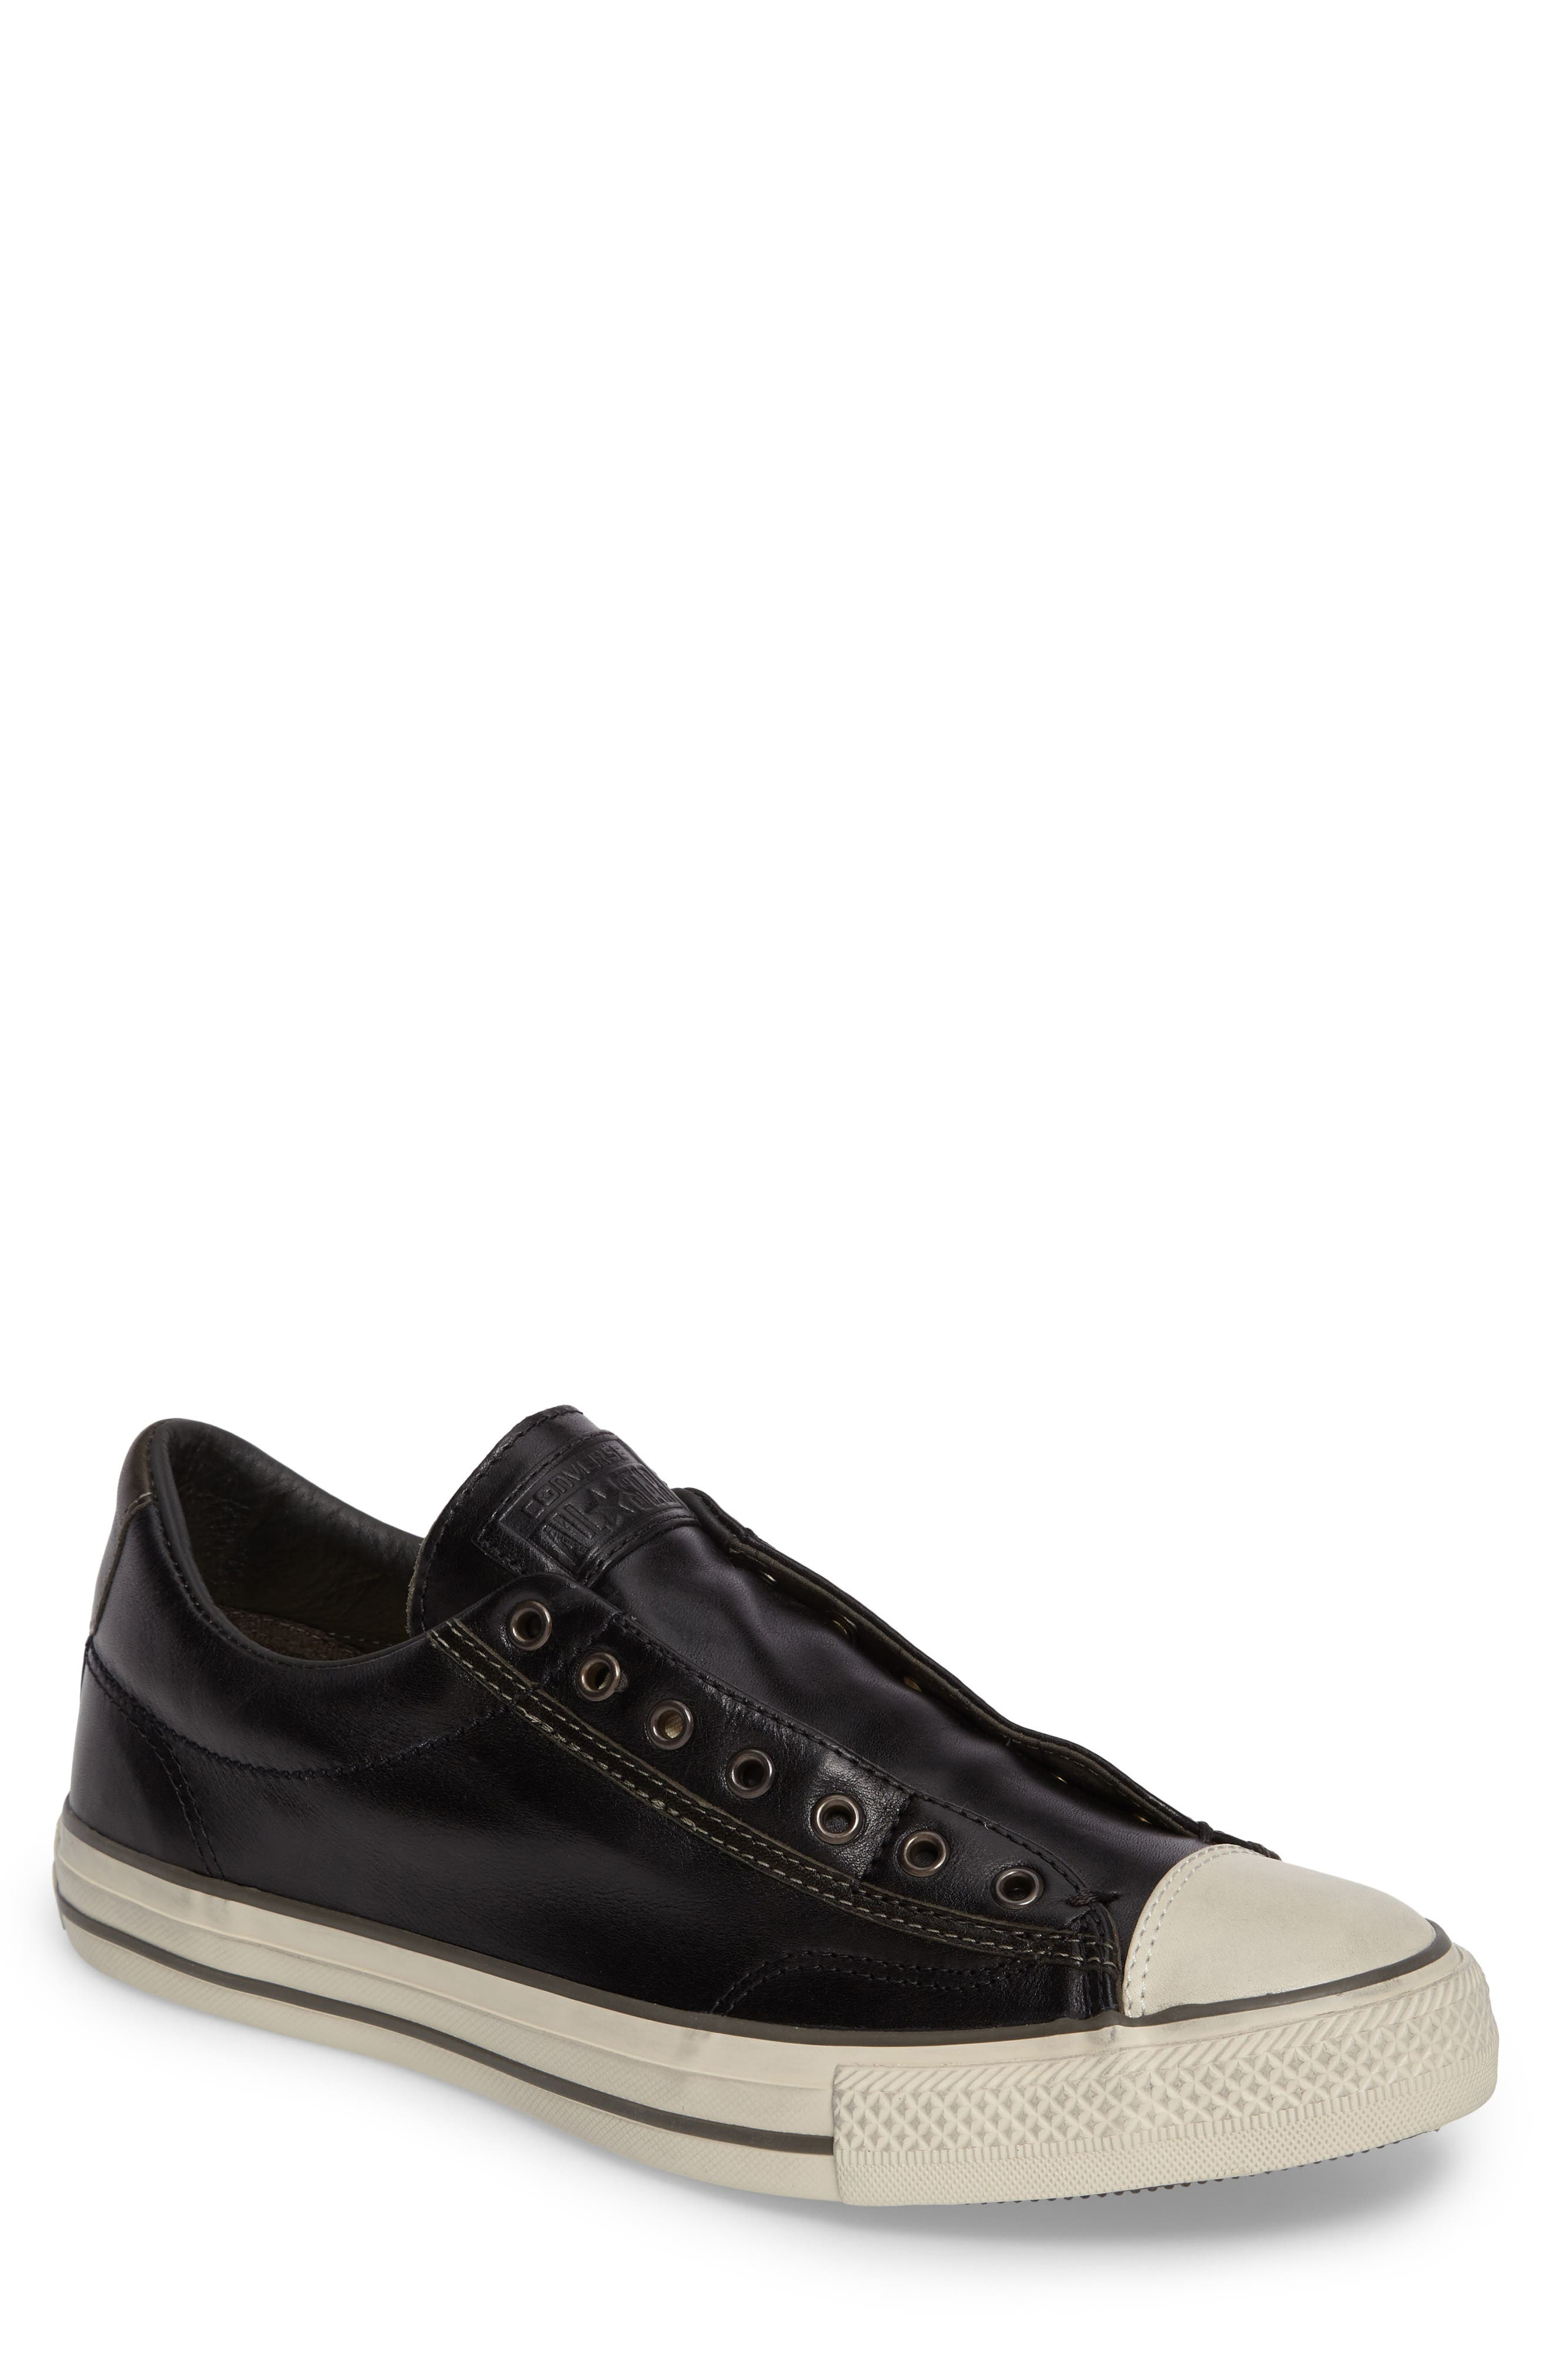 Converse by John Varvatos Sneaker (Men)